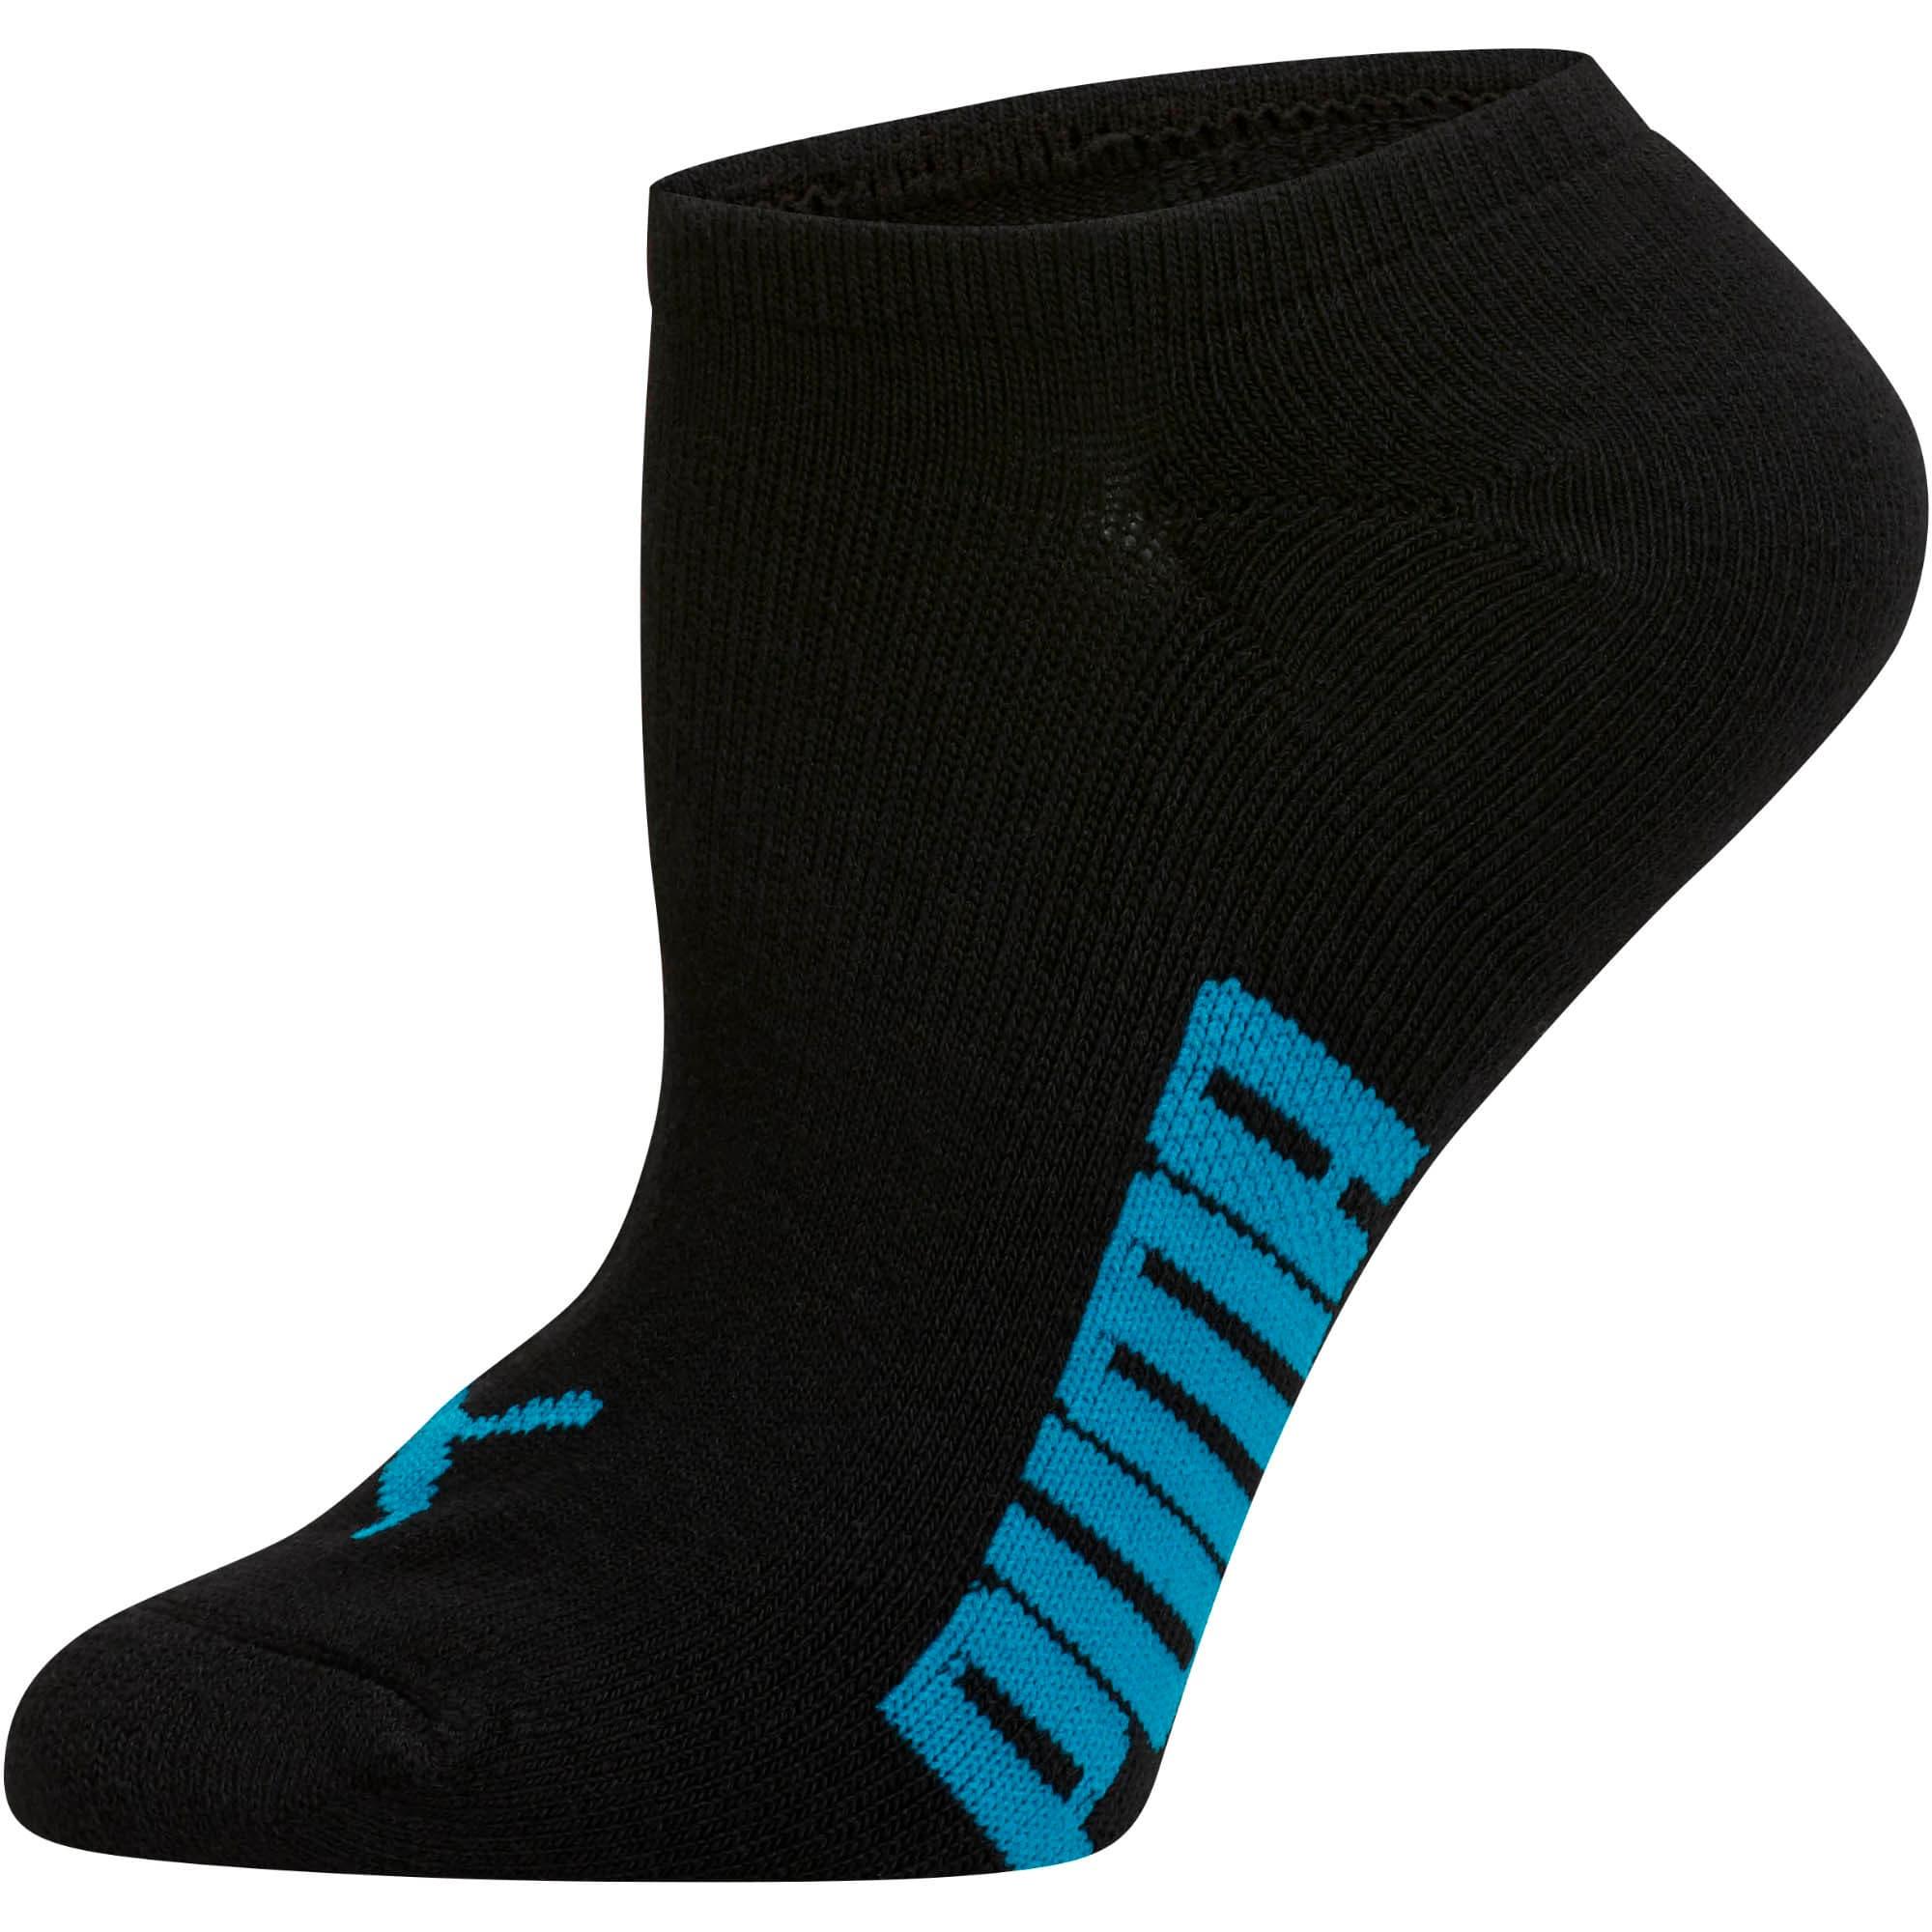 Thumbnail 4 of Women's Invisible No Show Socks (3 Pack), PINK COMBO, medium